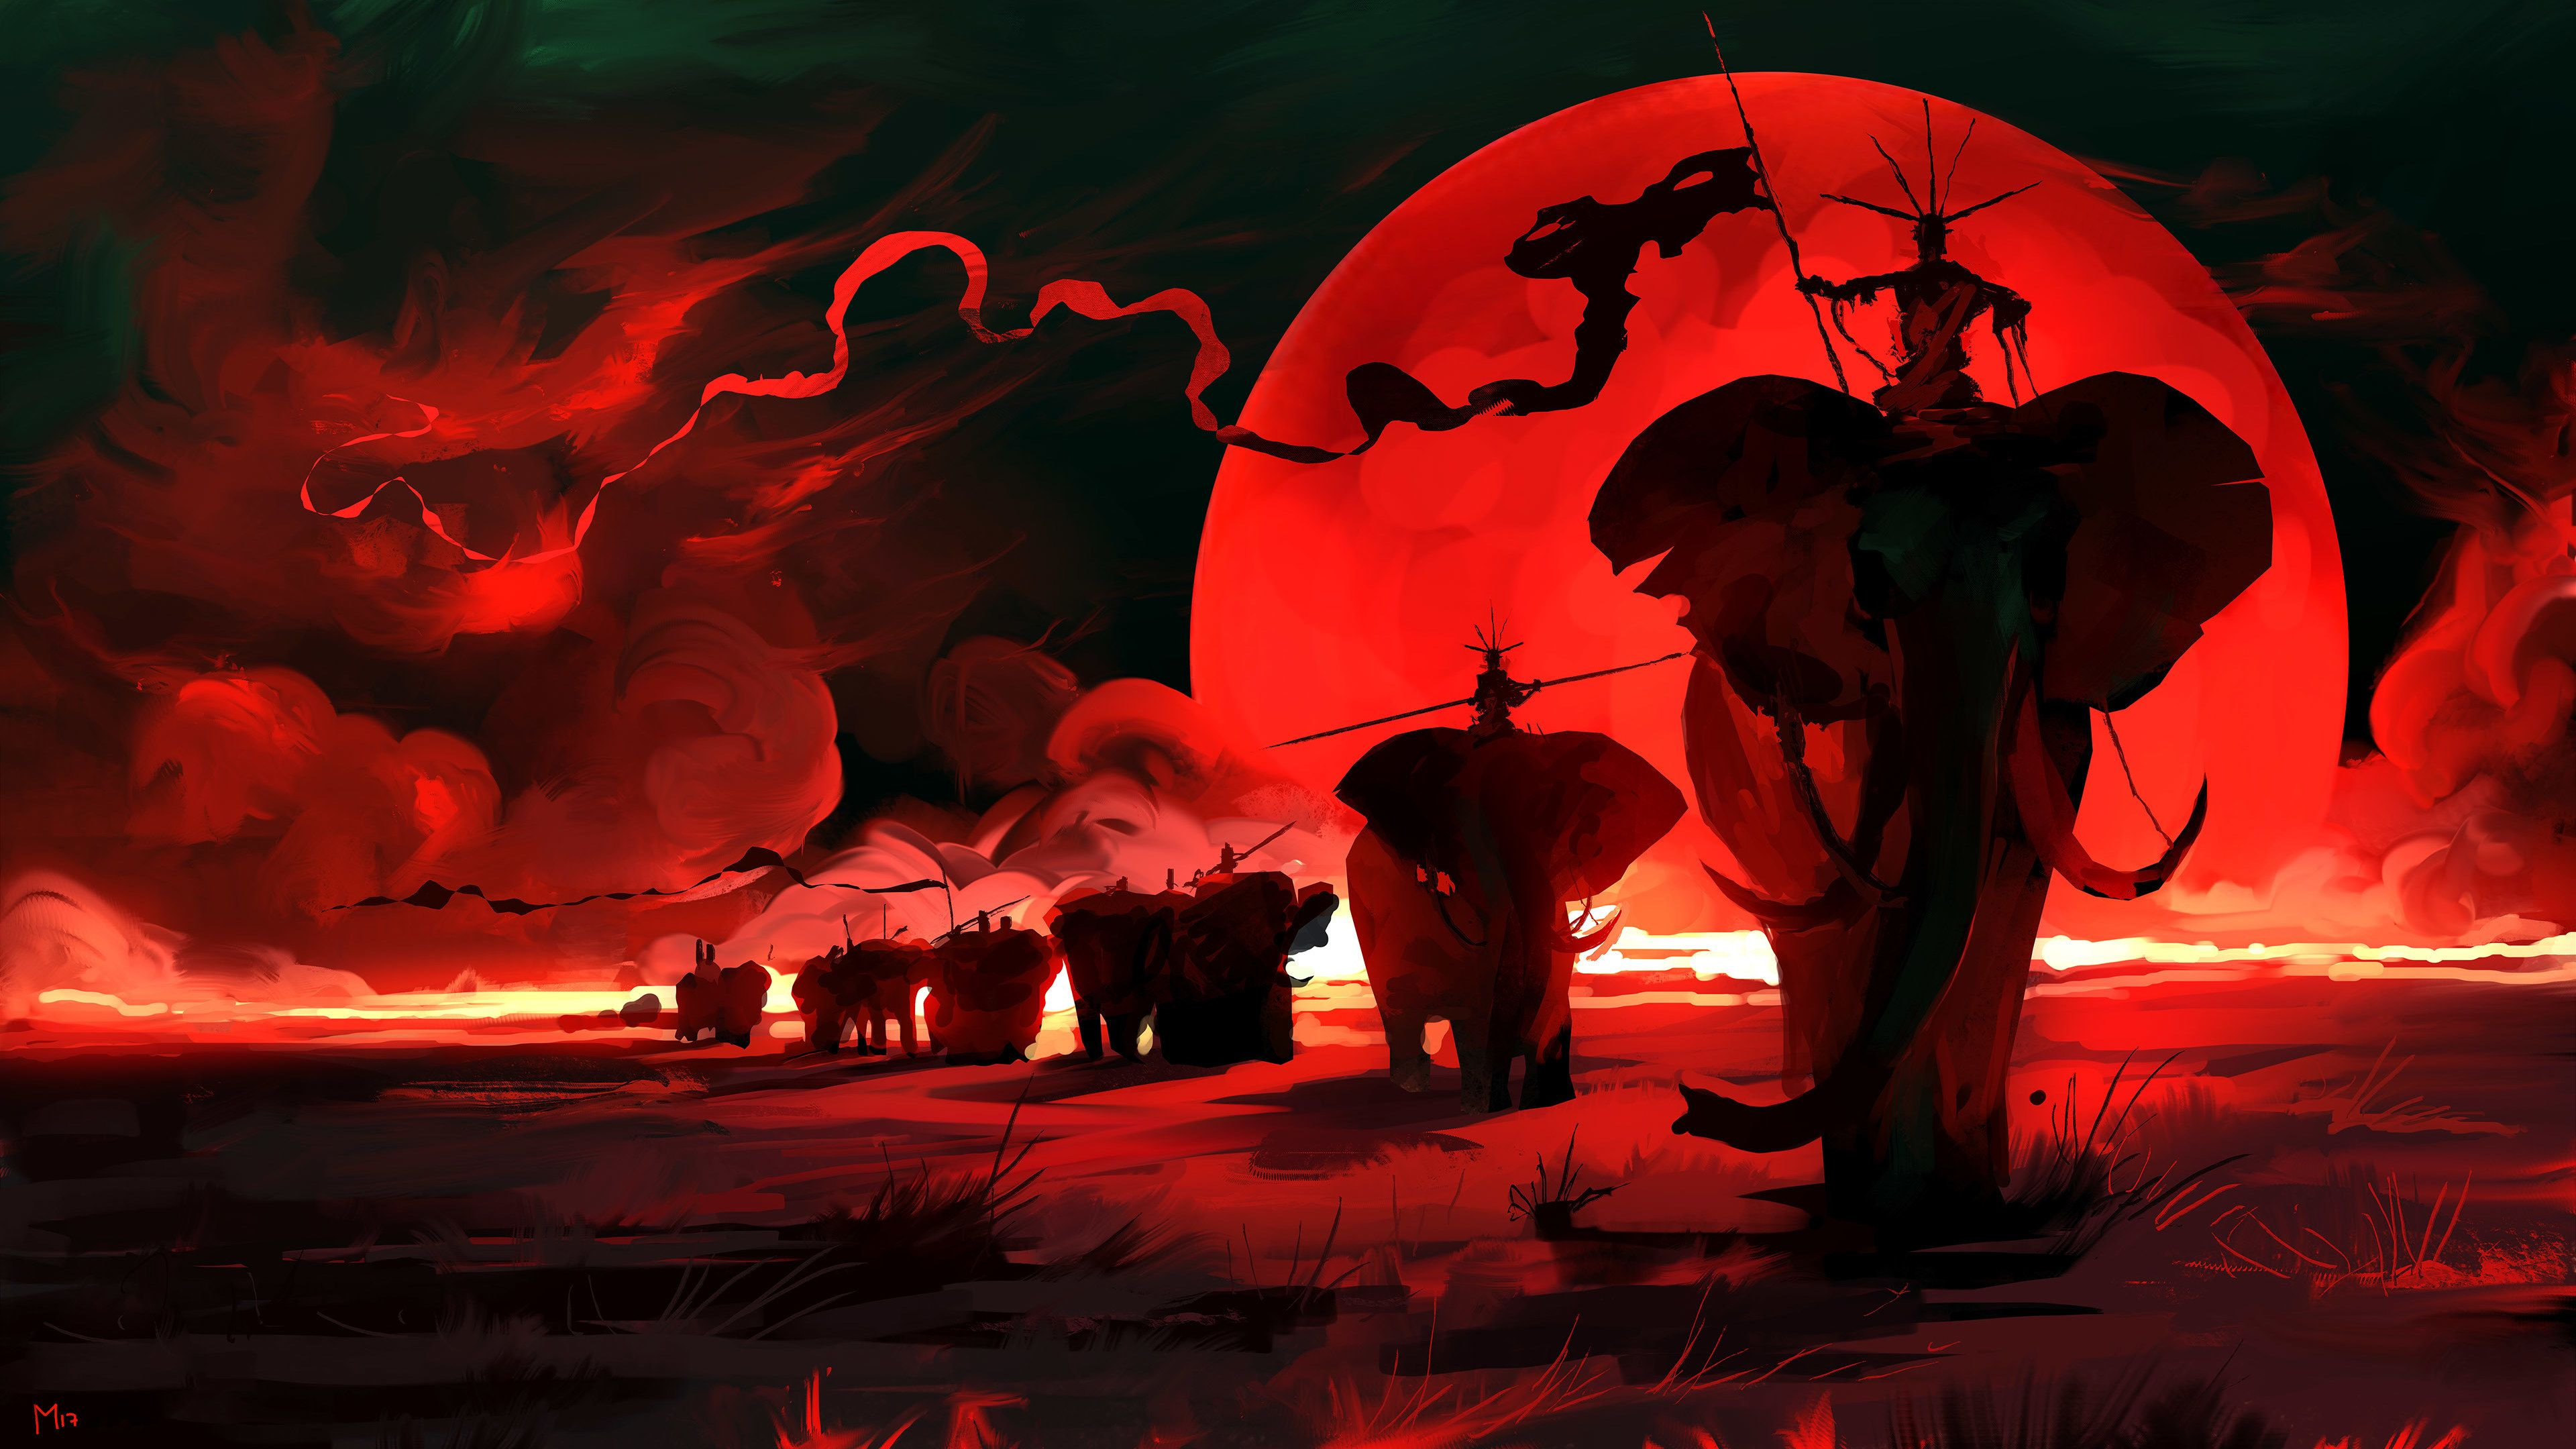 Elpehant Red Moon Digital Art 4k Hd Wallpapers Elephant Wallpapers Digital Art Wallpapers Behance Wallpapers Artwork Wa Moon Art Print Moon Art Fantasy Art